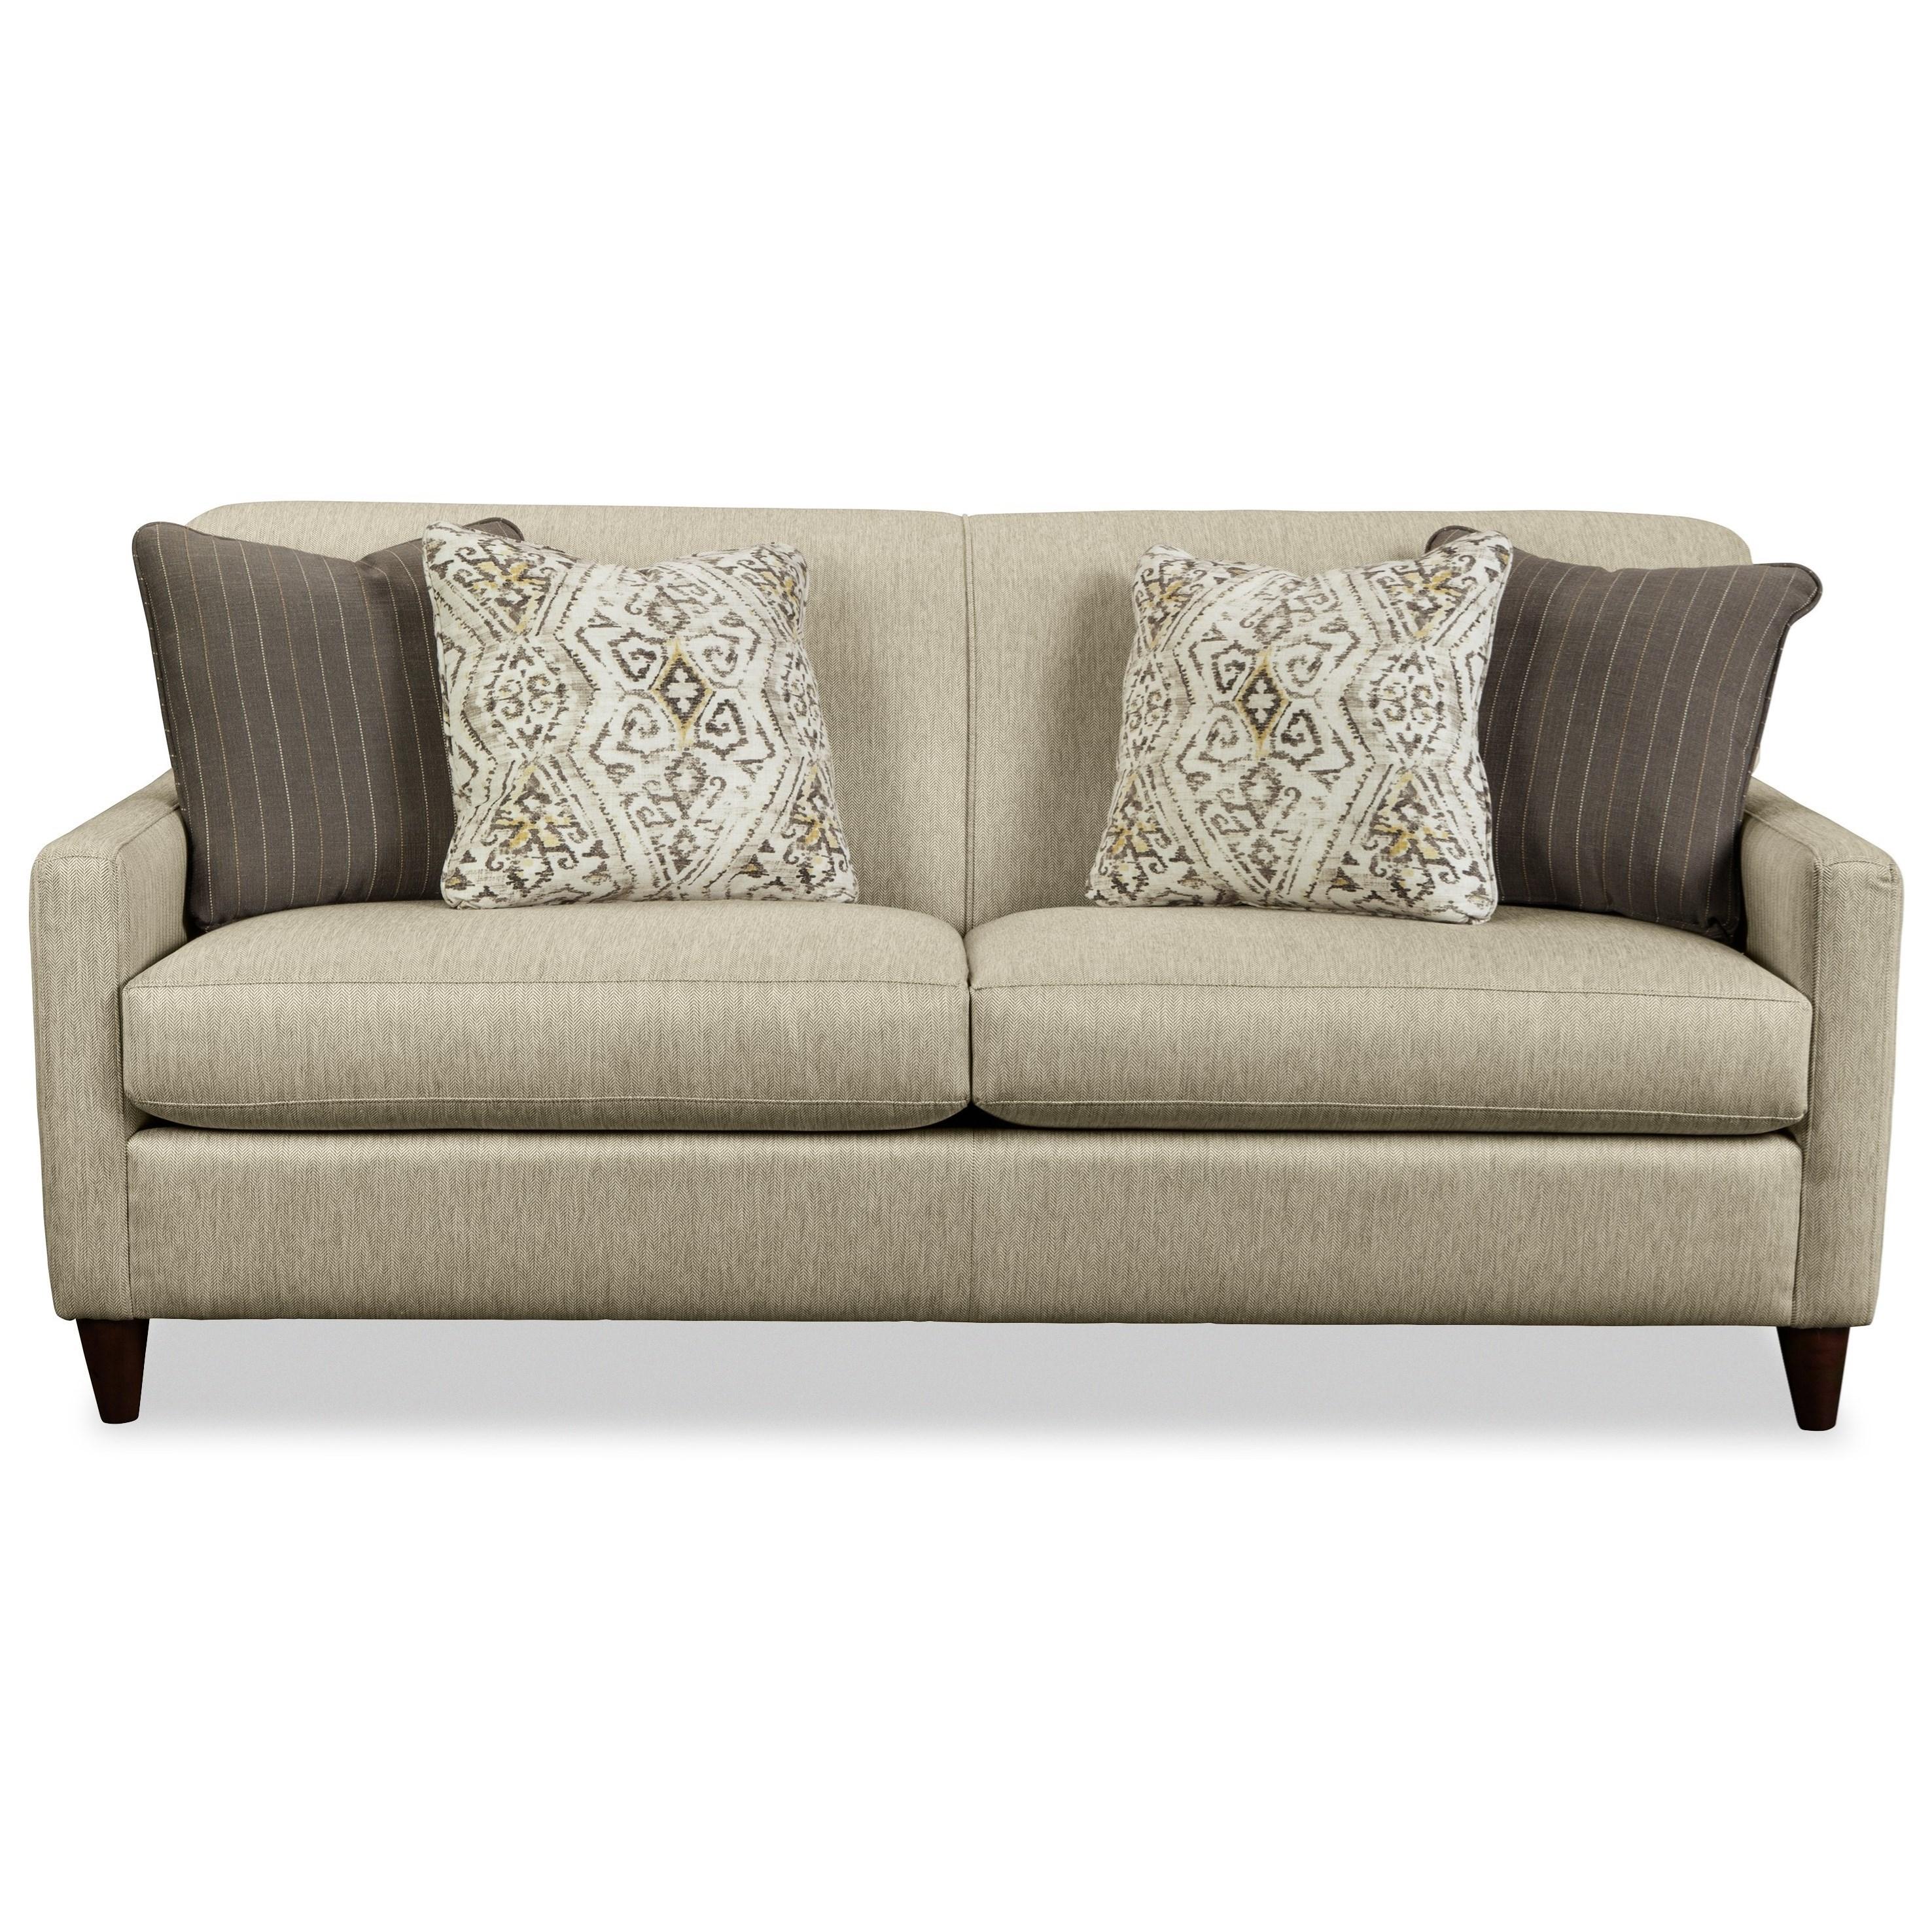 Craftmaster 770450 770450 Contemporary Apartment-Size Sofa